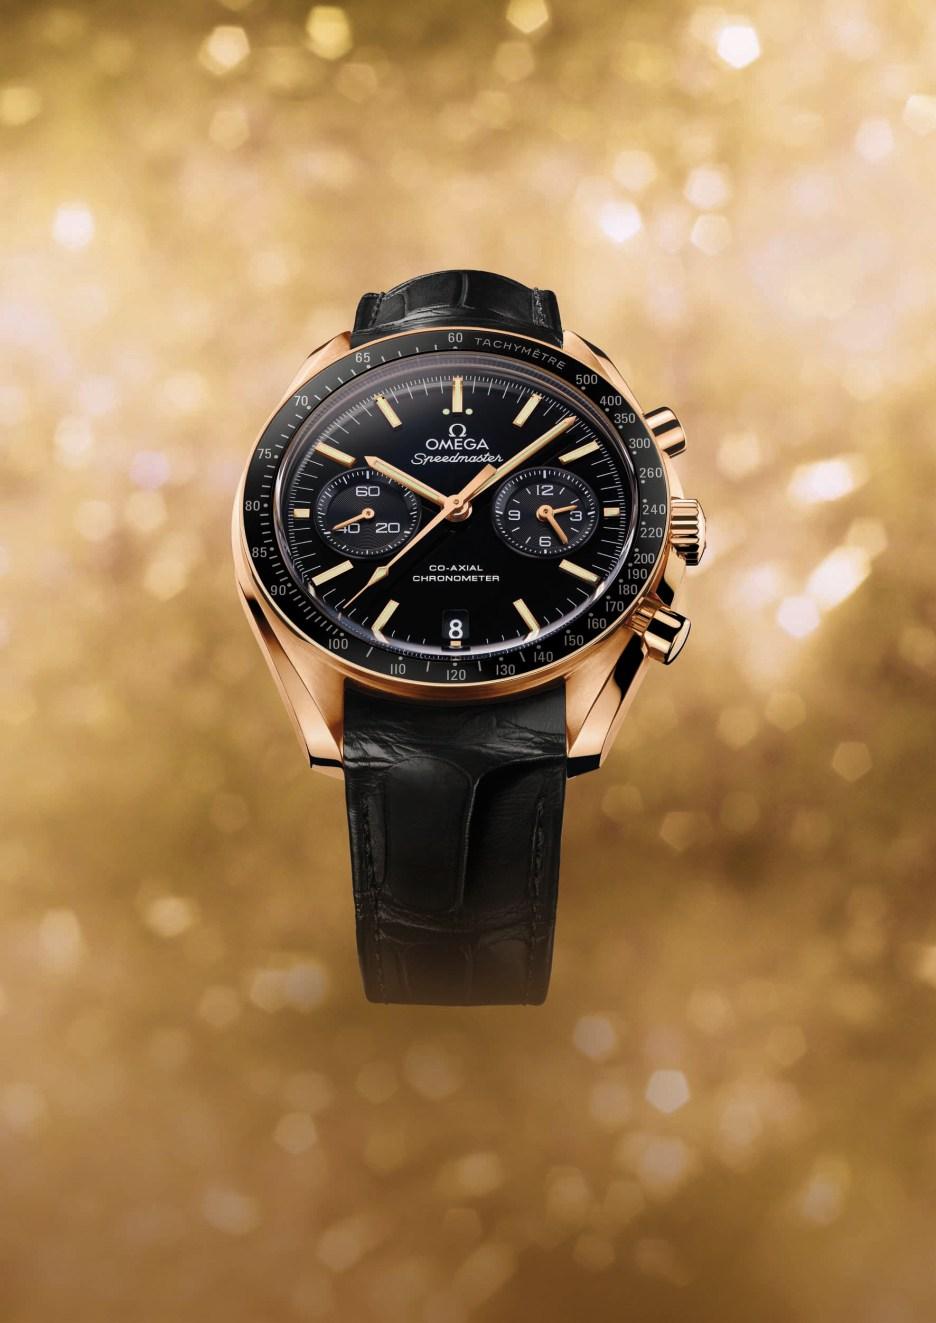 Christmas_2011_Speedmaster_Chrono_Co-Axial_311.63.44.51.01.001